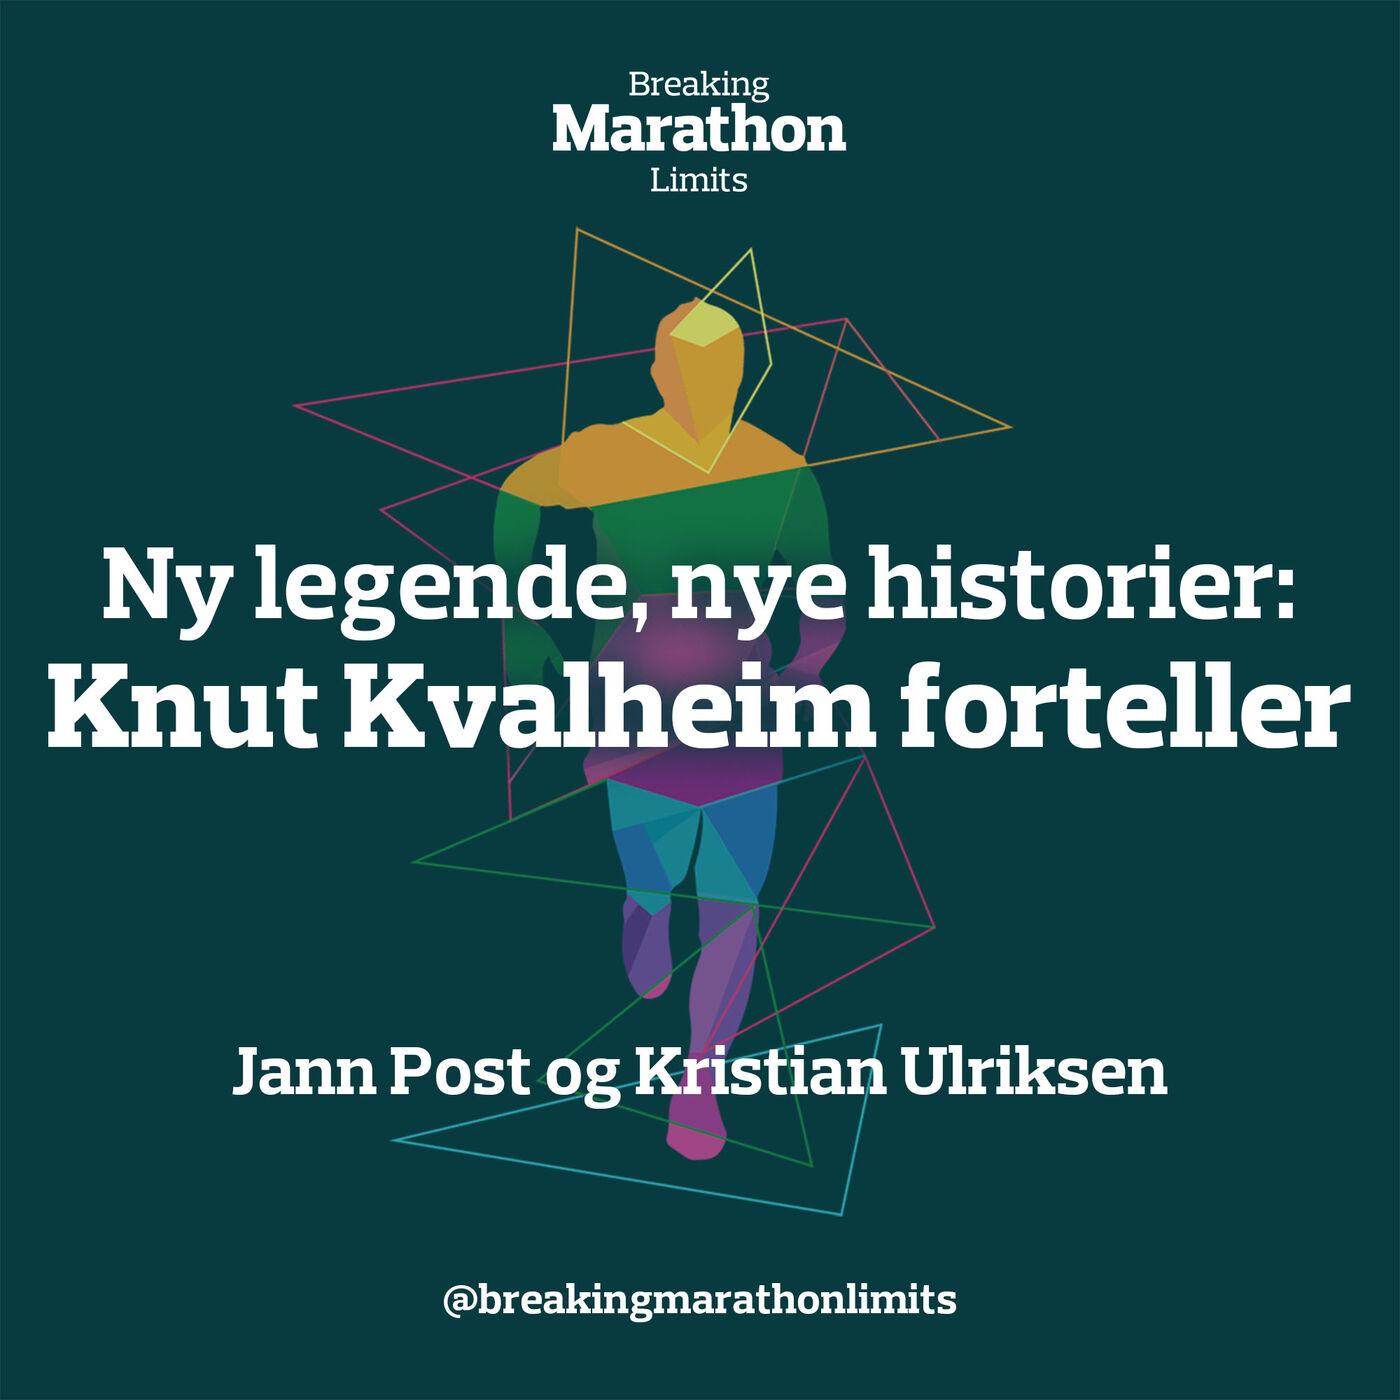 Knut Kvalheim forteller